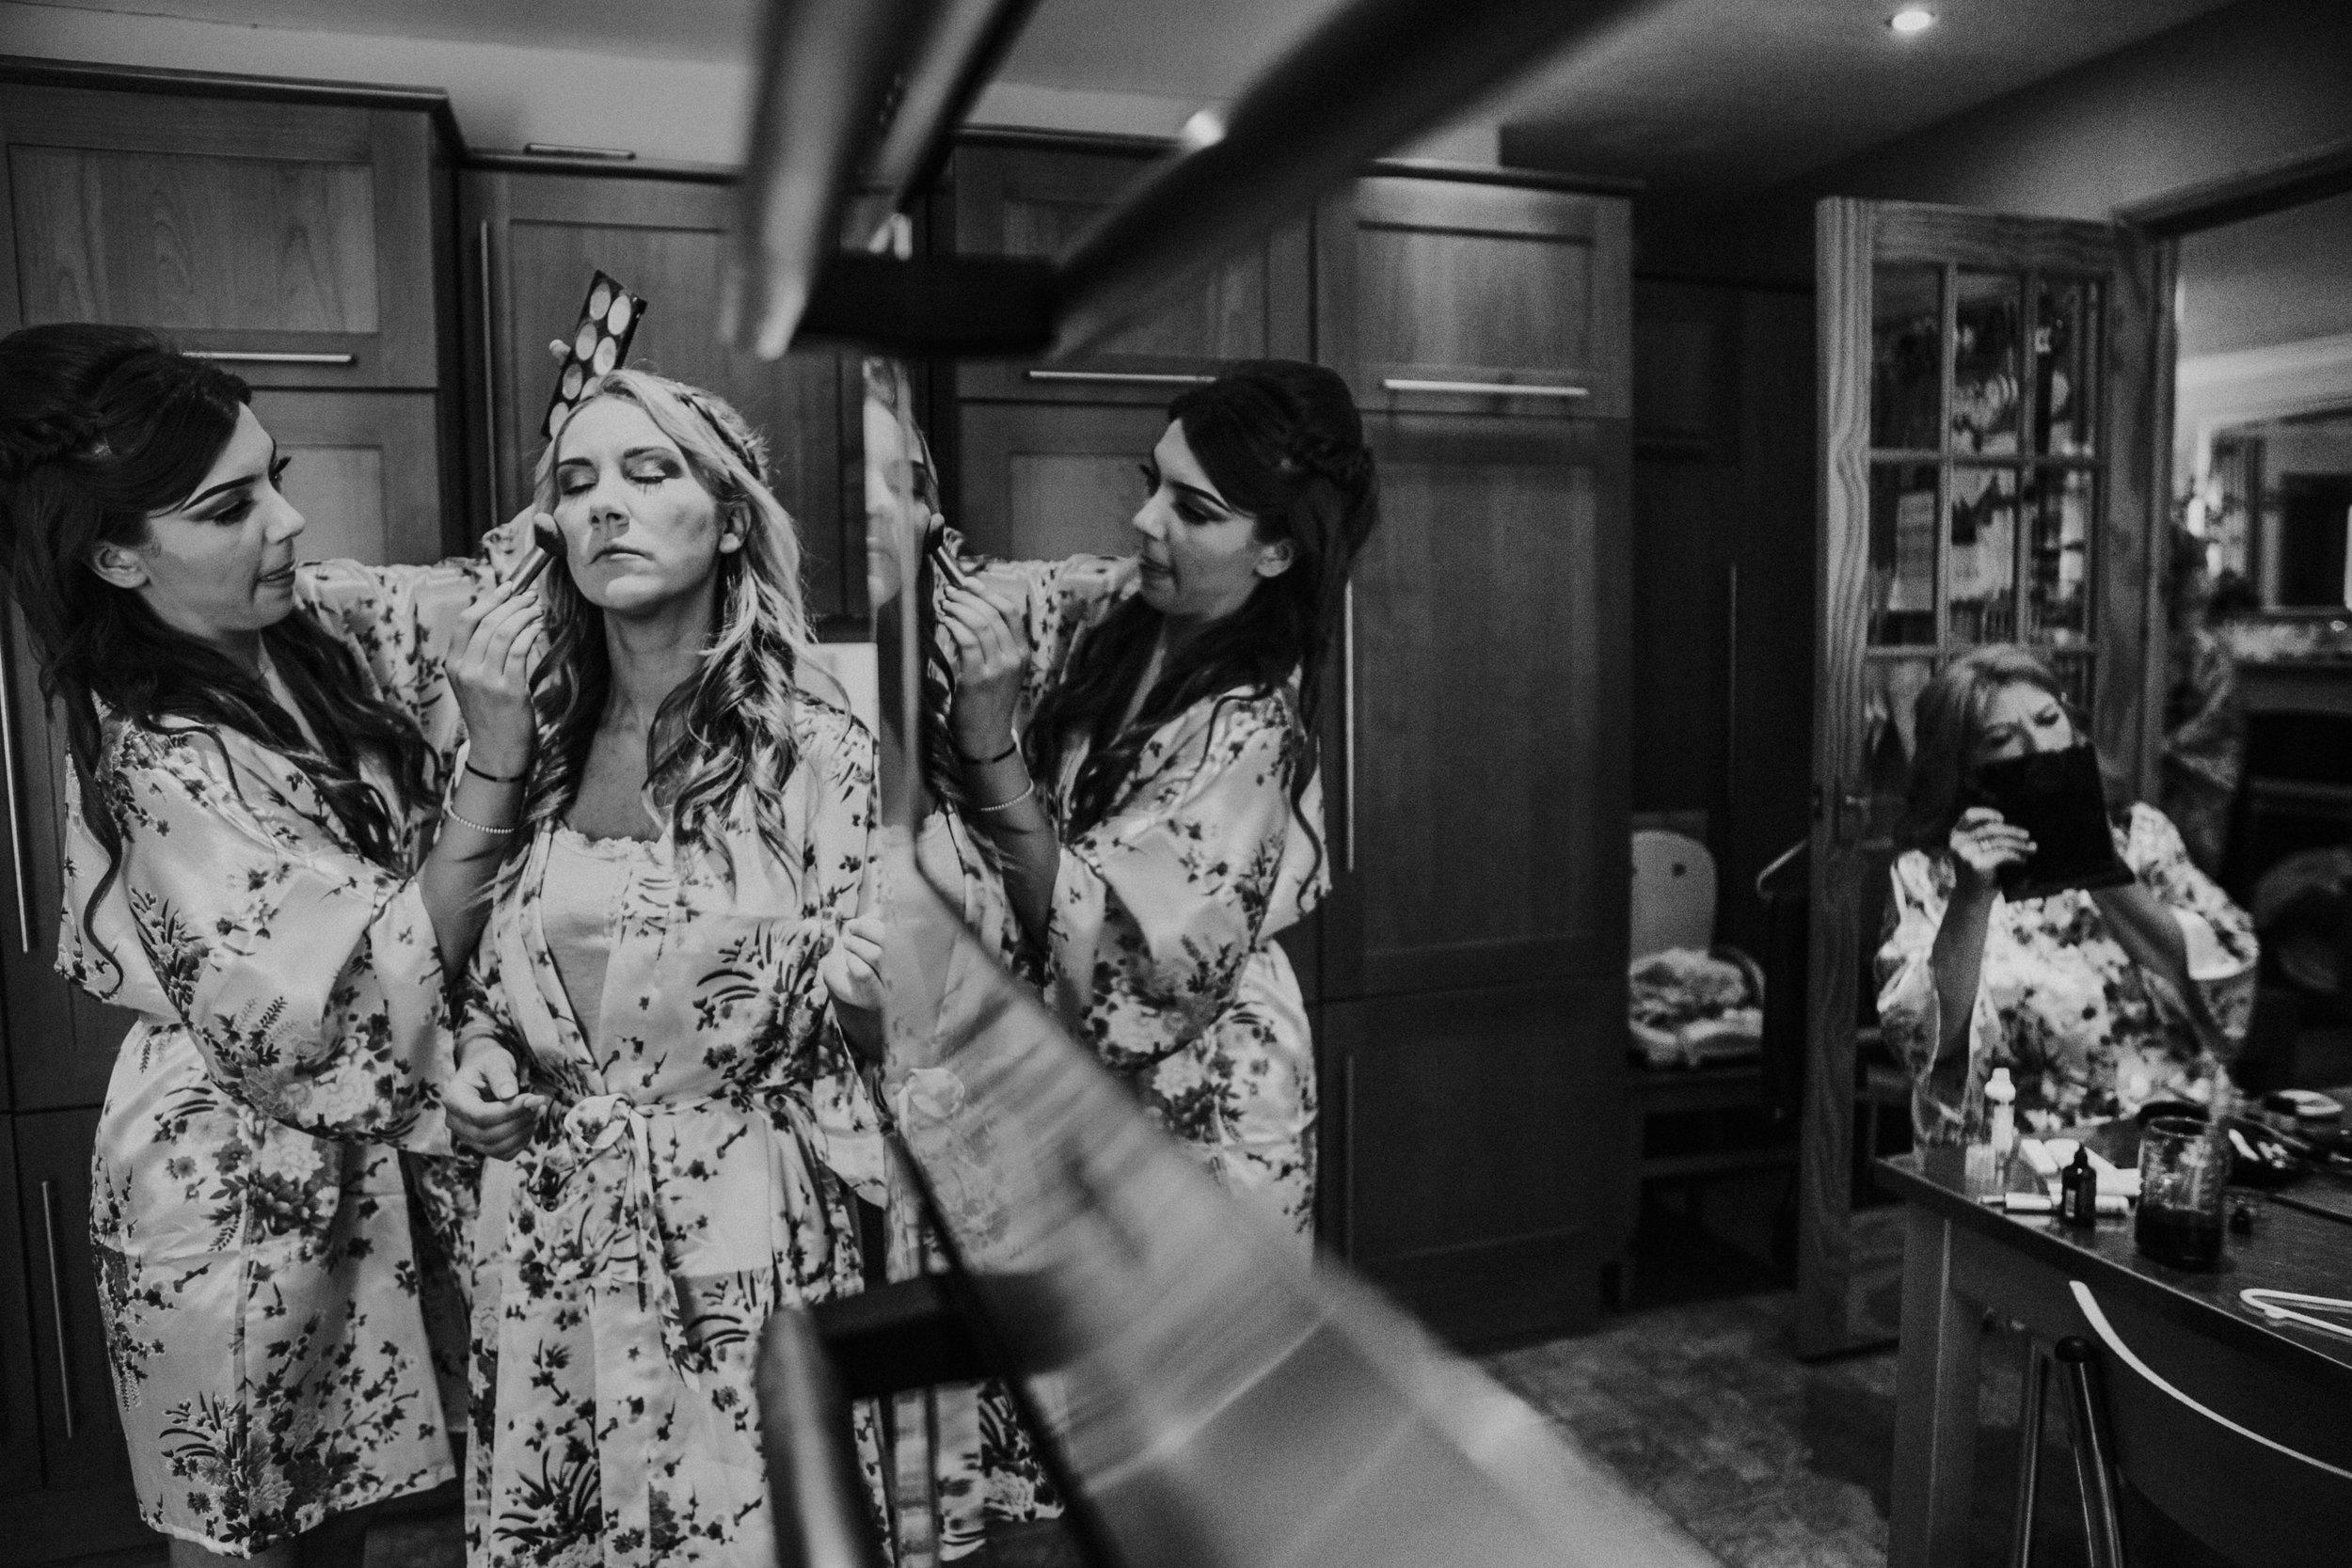 hertfordshire-hitchin-london-wedding-photography-St-bonaventures-catholic-church-bridal-prep-02